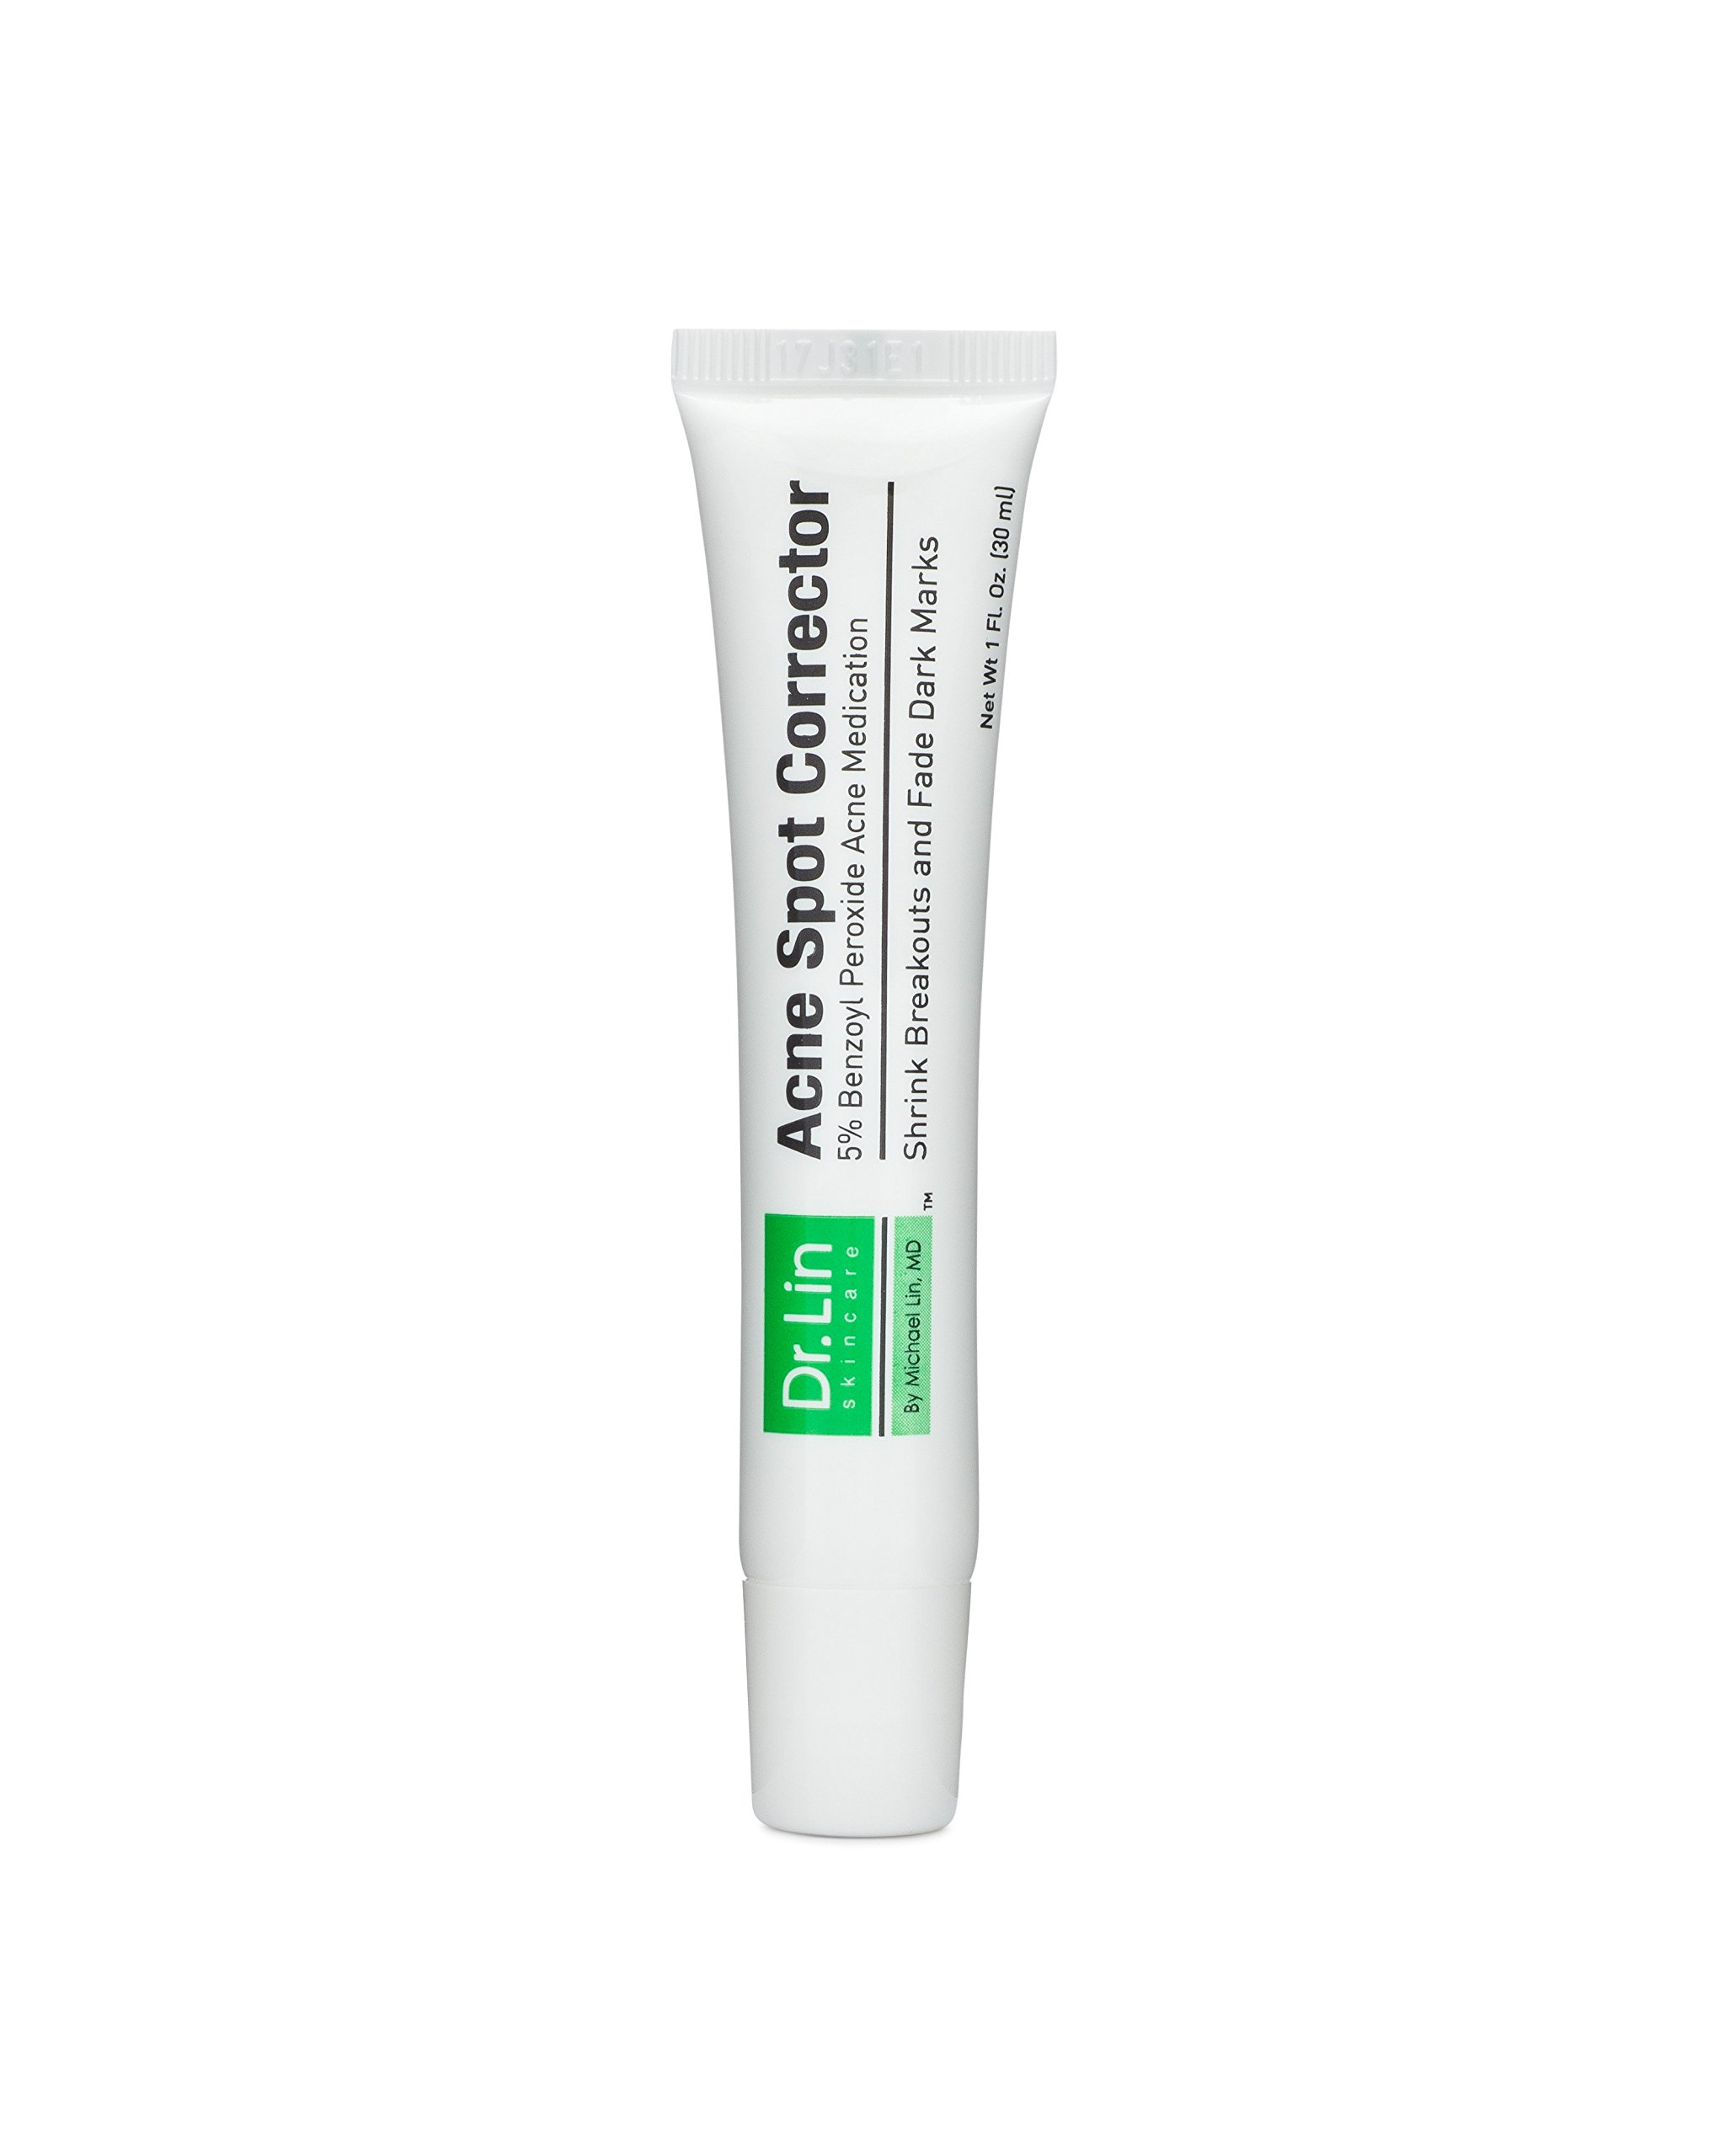 Dr. Lin Skincare - Dr. Lin Skincare Acne Spot Corrector, 1 Ounce